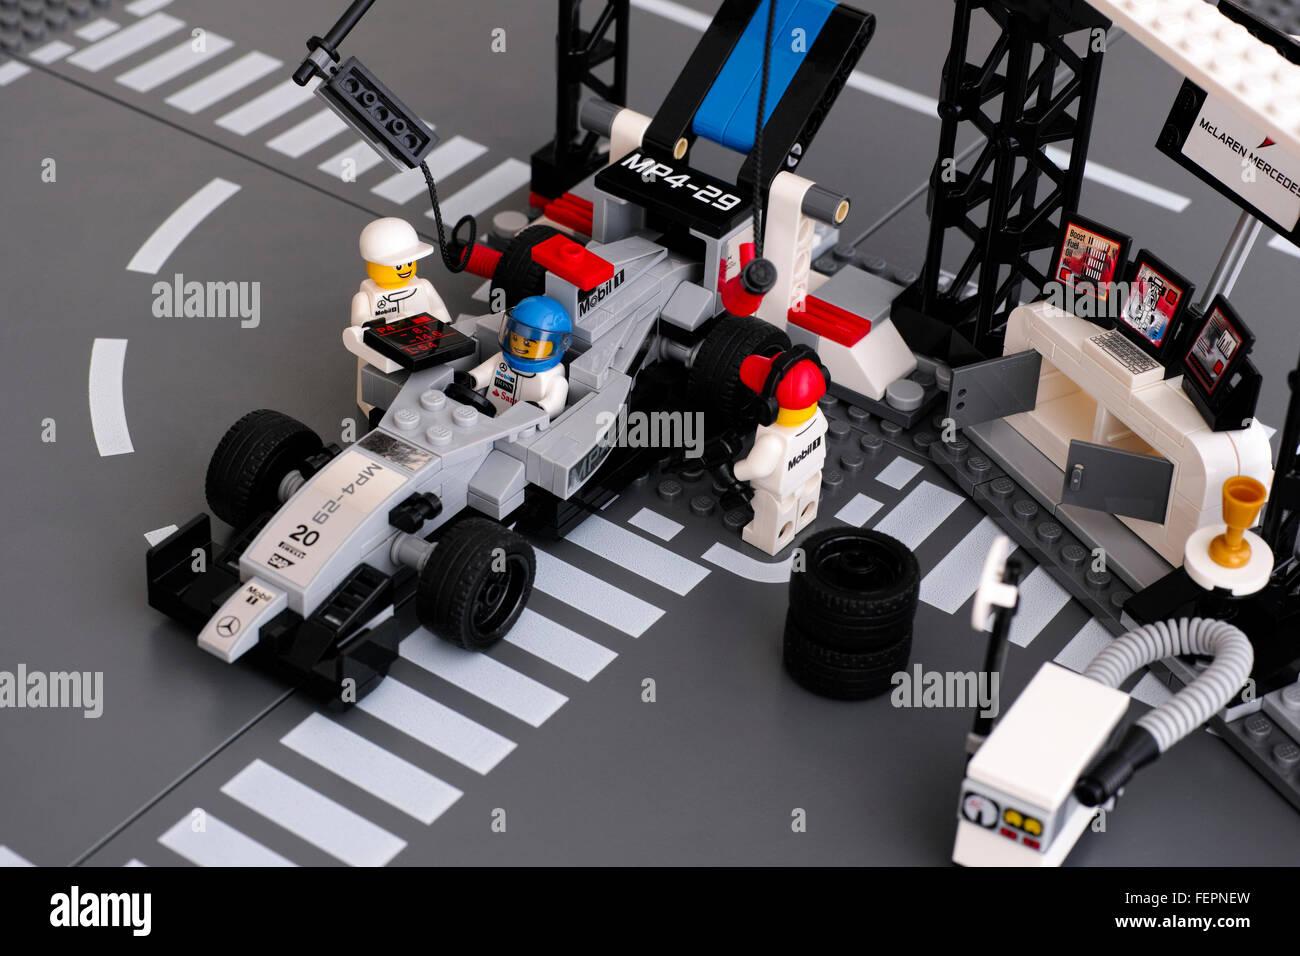 lego mp4 29 race car in mclaren mercedes pit stop by lego. Black Bedroom Furniture Sets. Home Design Ideas